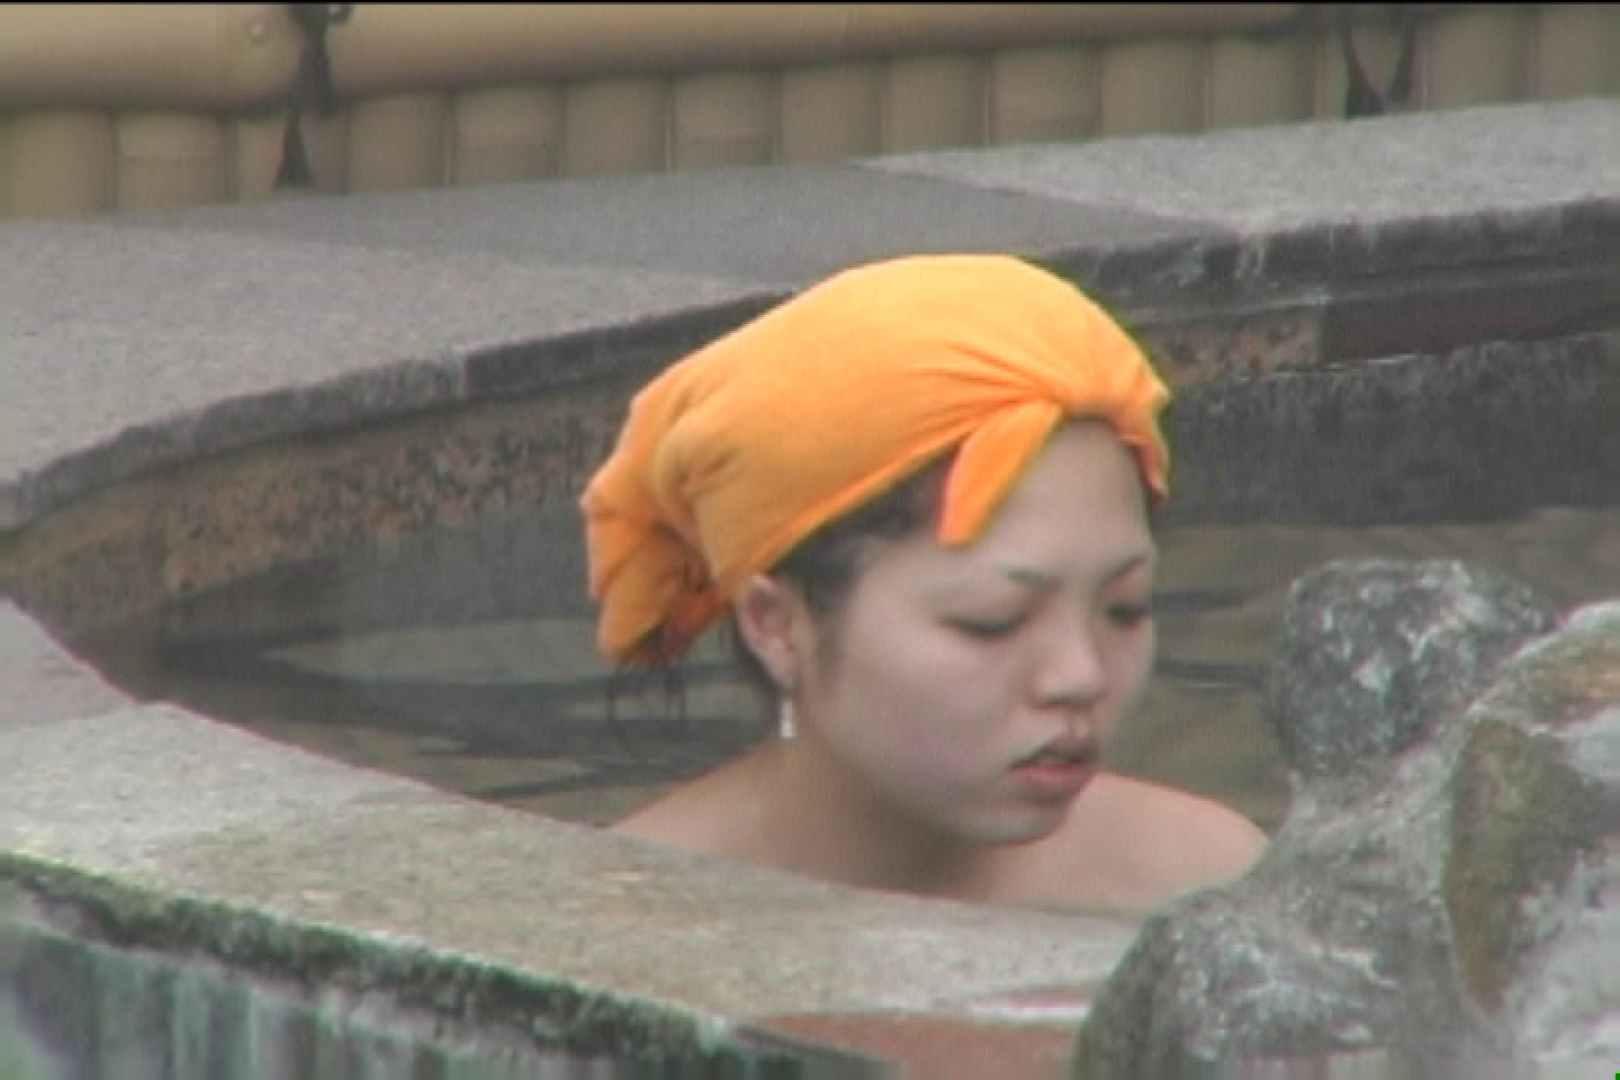 高画質露天女風呂観察 vol.016 望遠 | エロい乙女  11枚 7